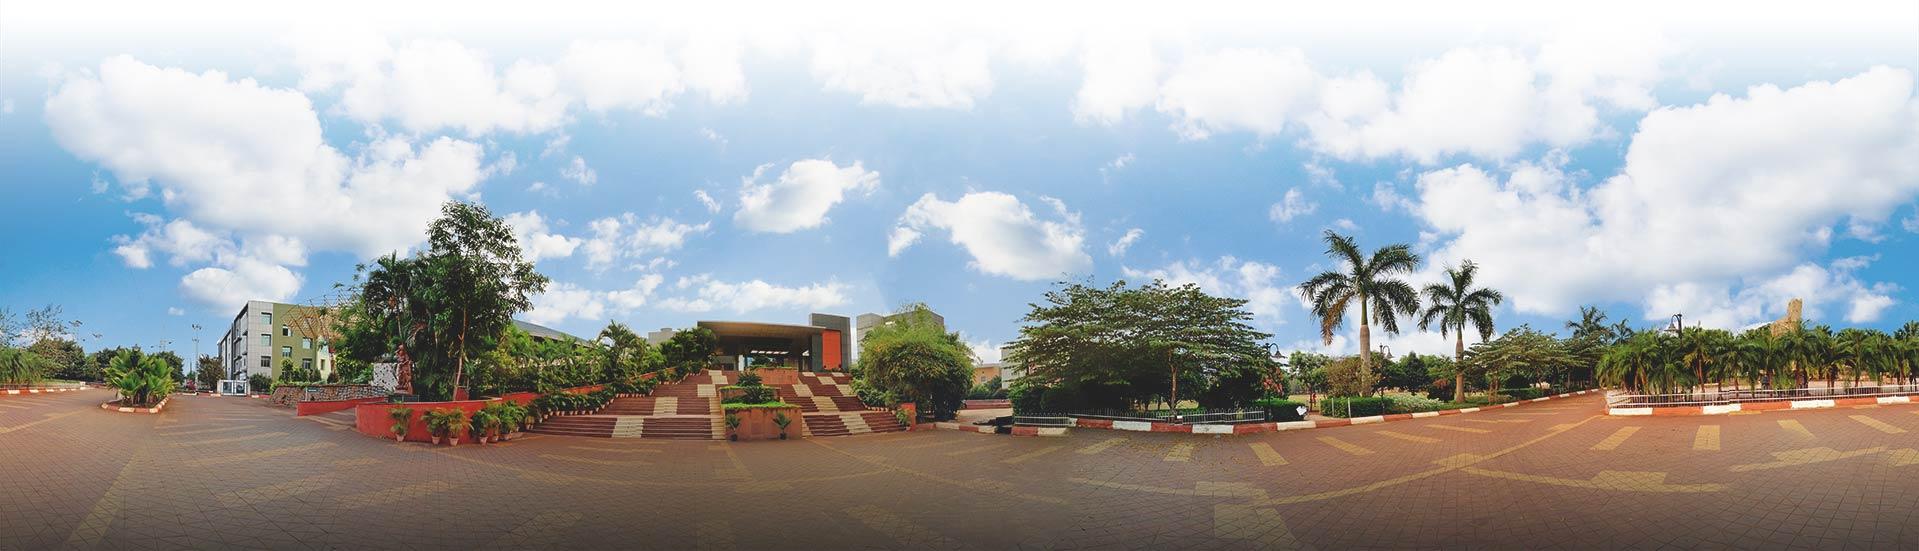 KIIT KSOM Campus 360 degree by Lipan